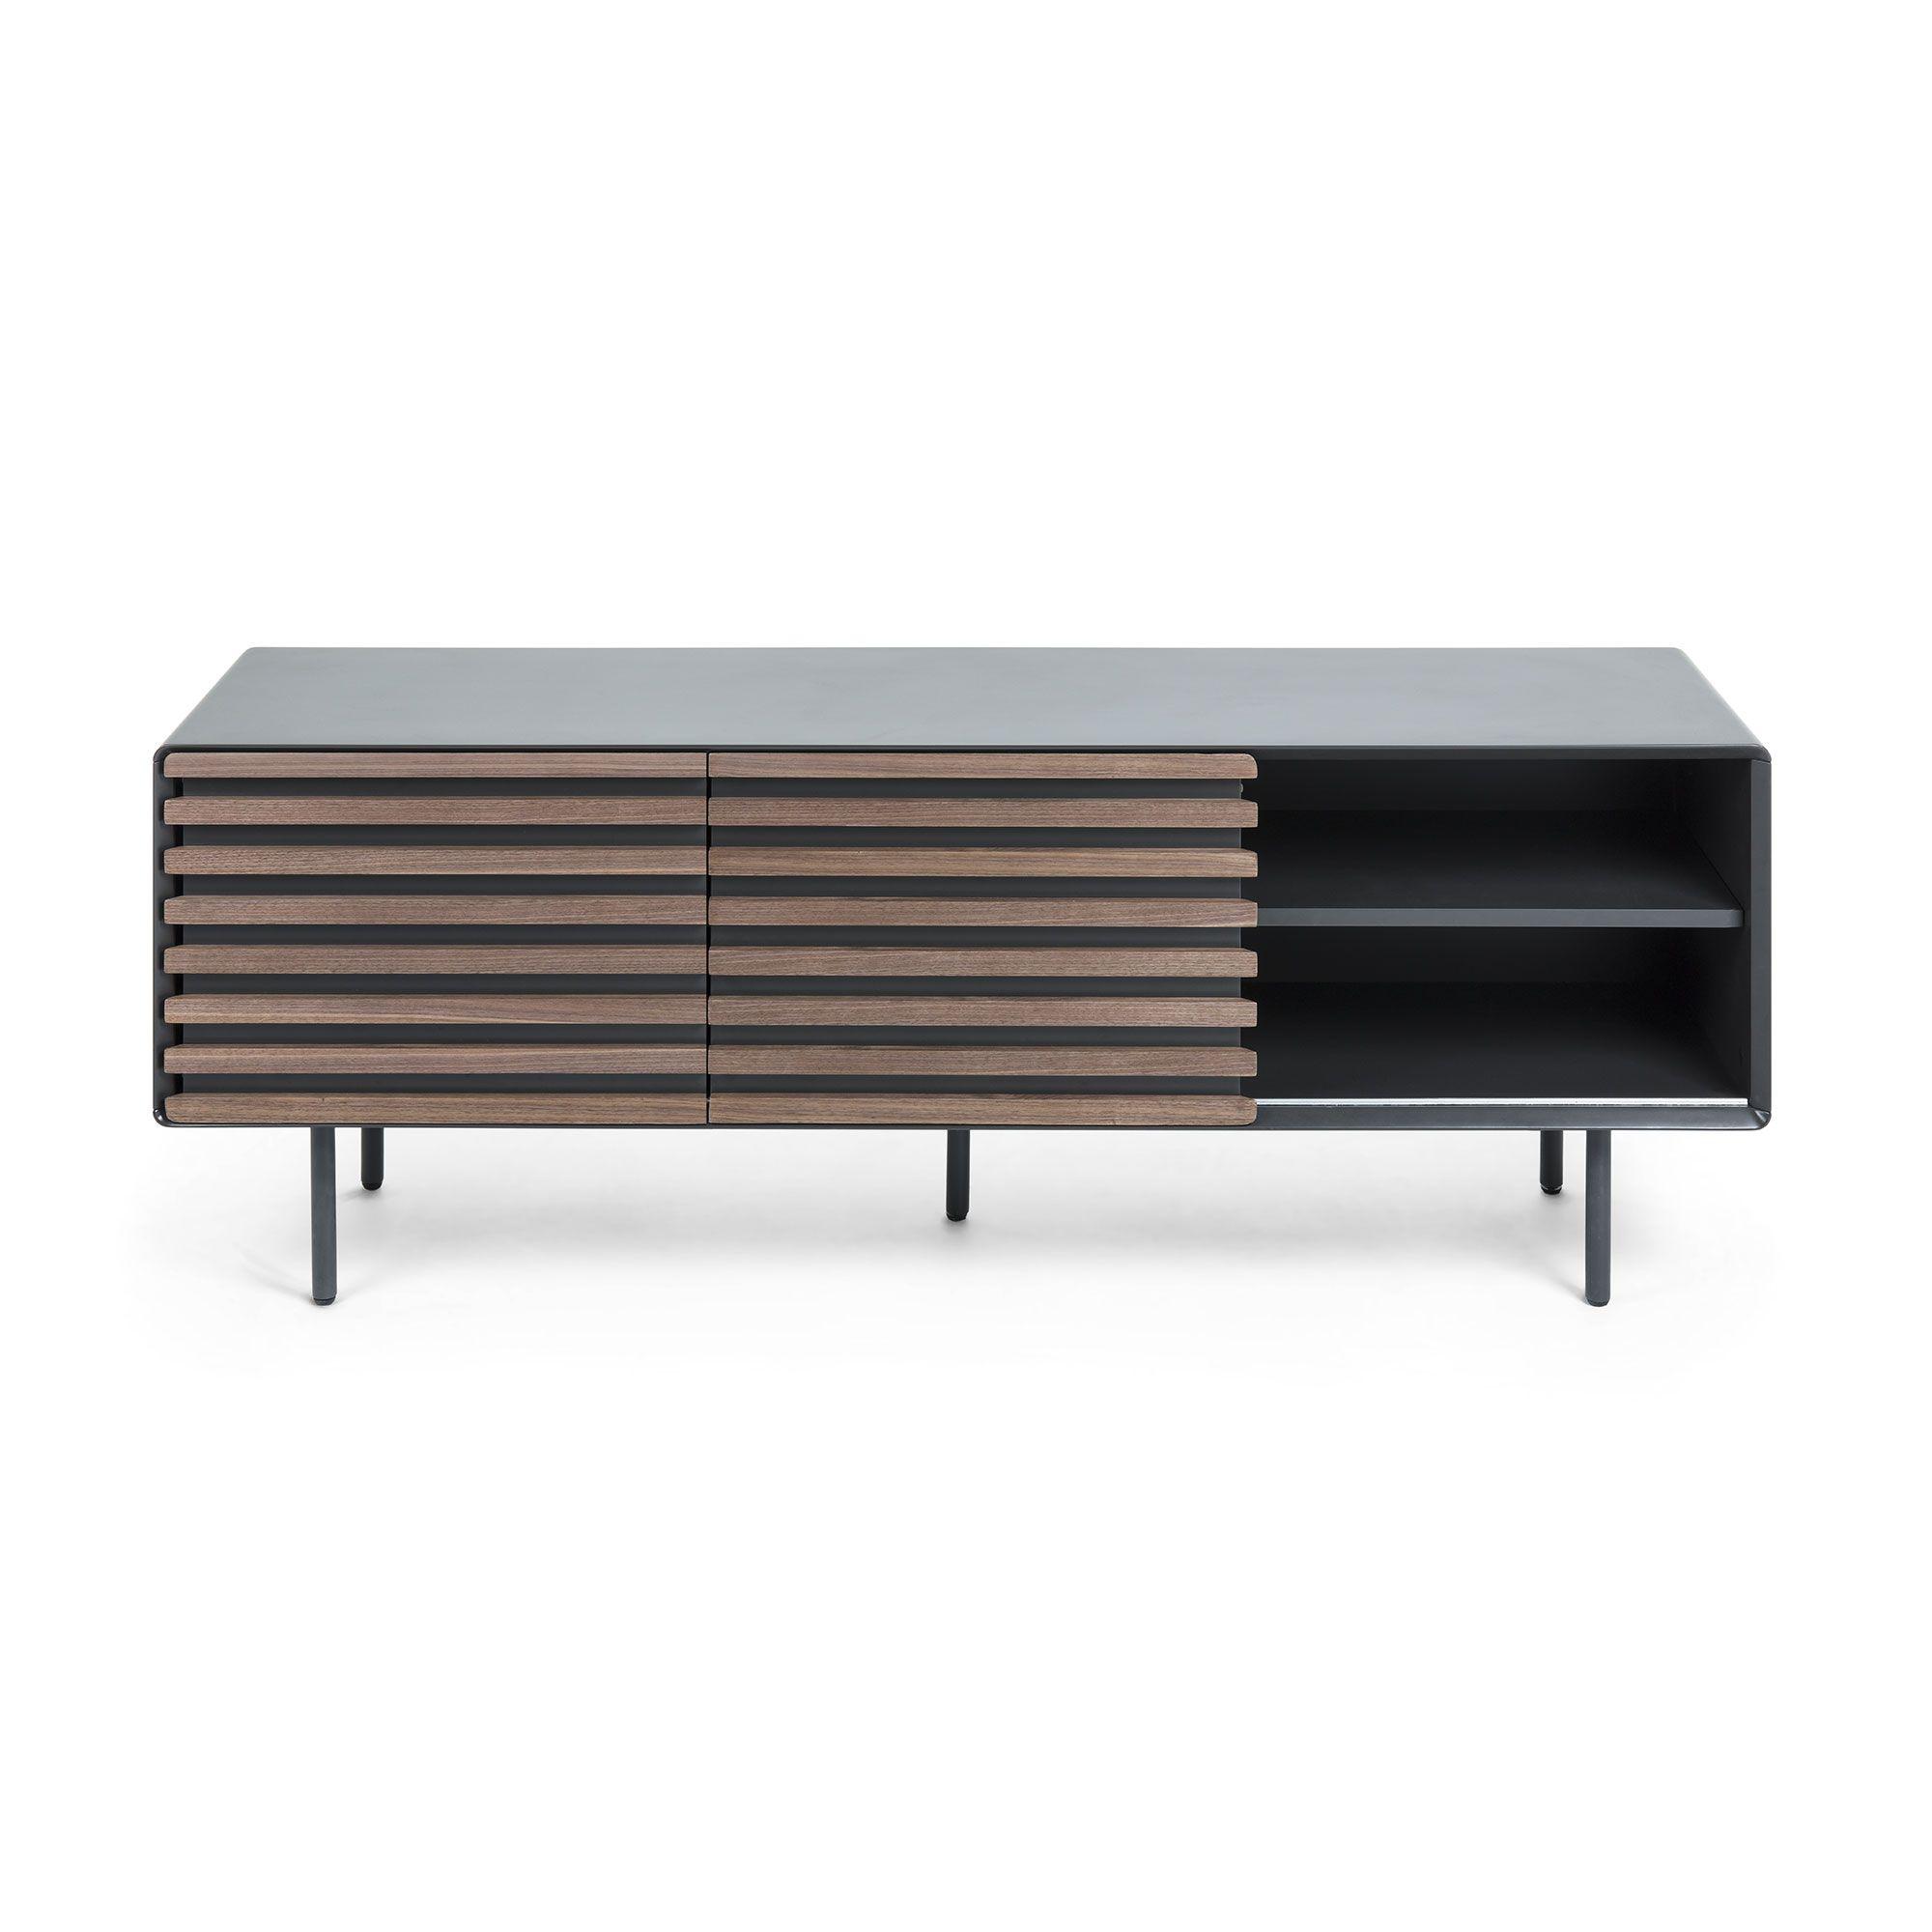 LaForma Mahon Tvbord 162x58 - Mat graphite